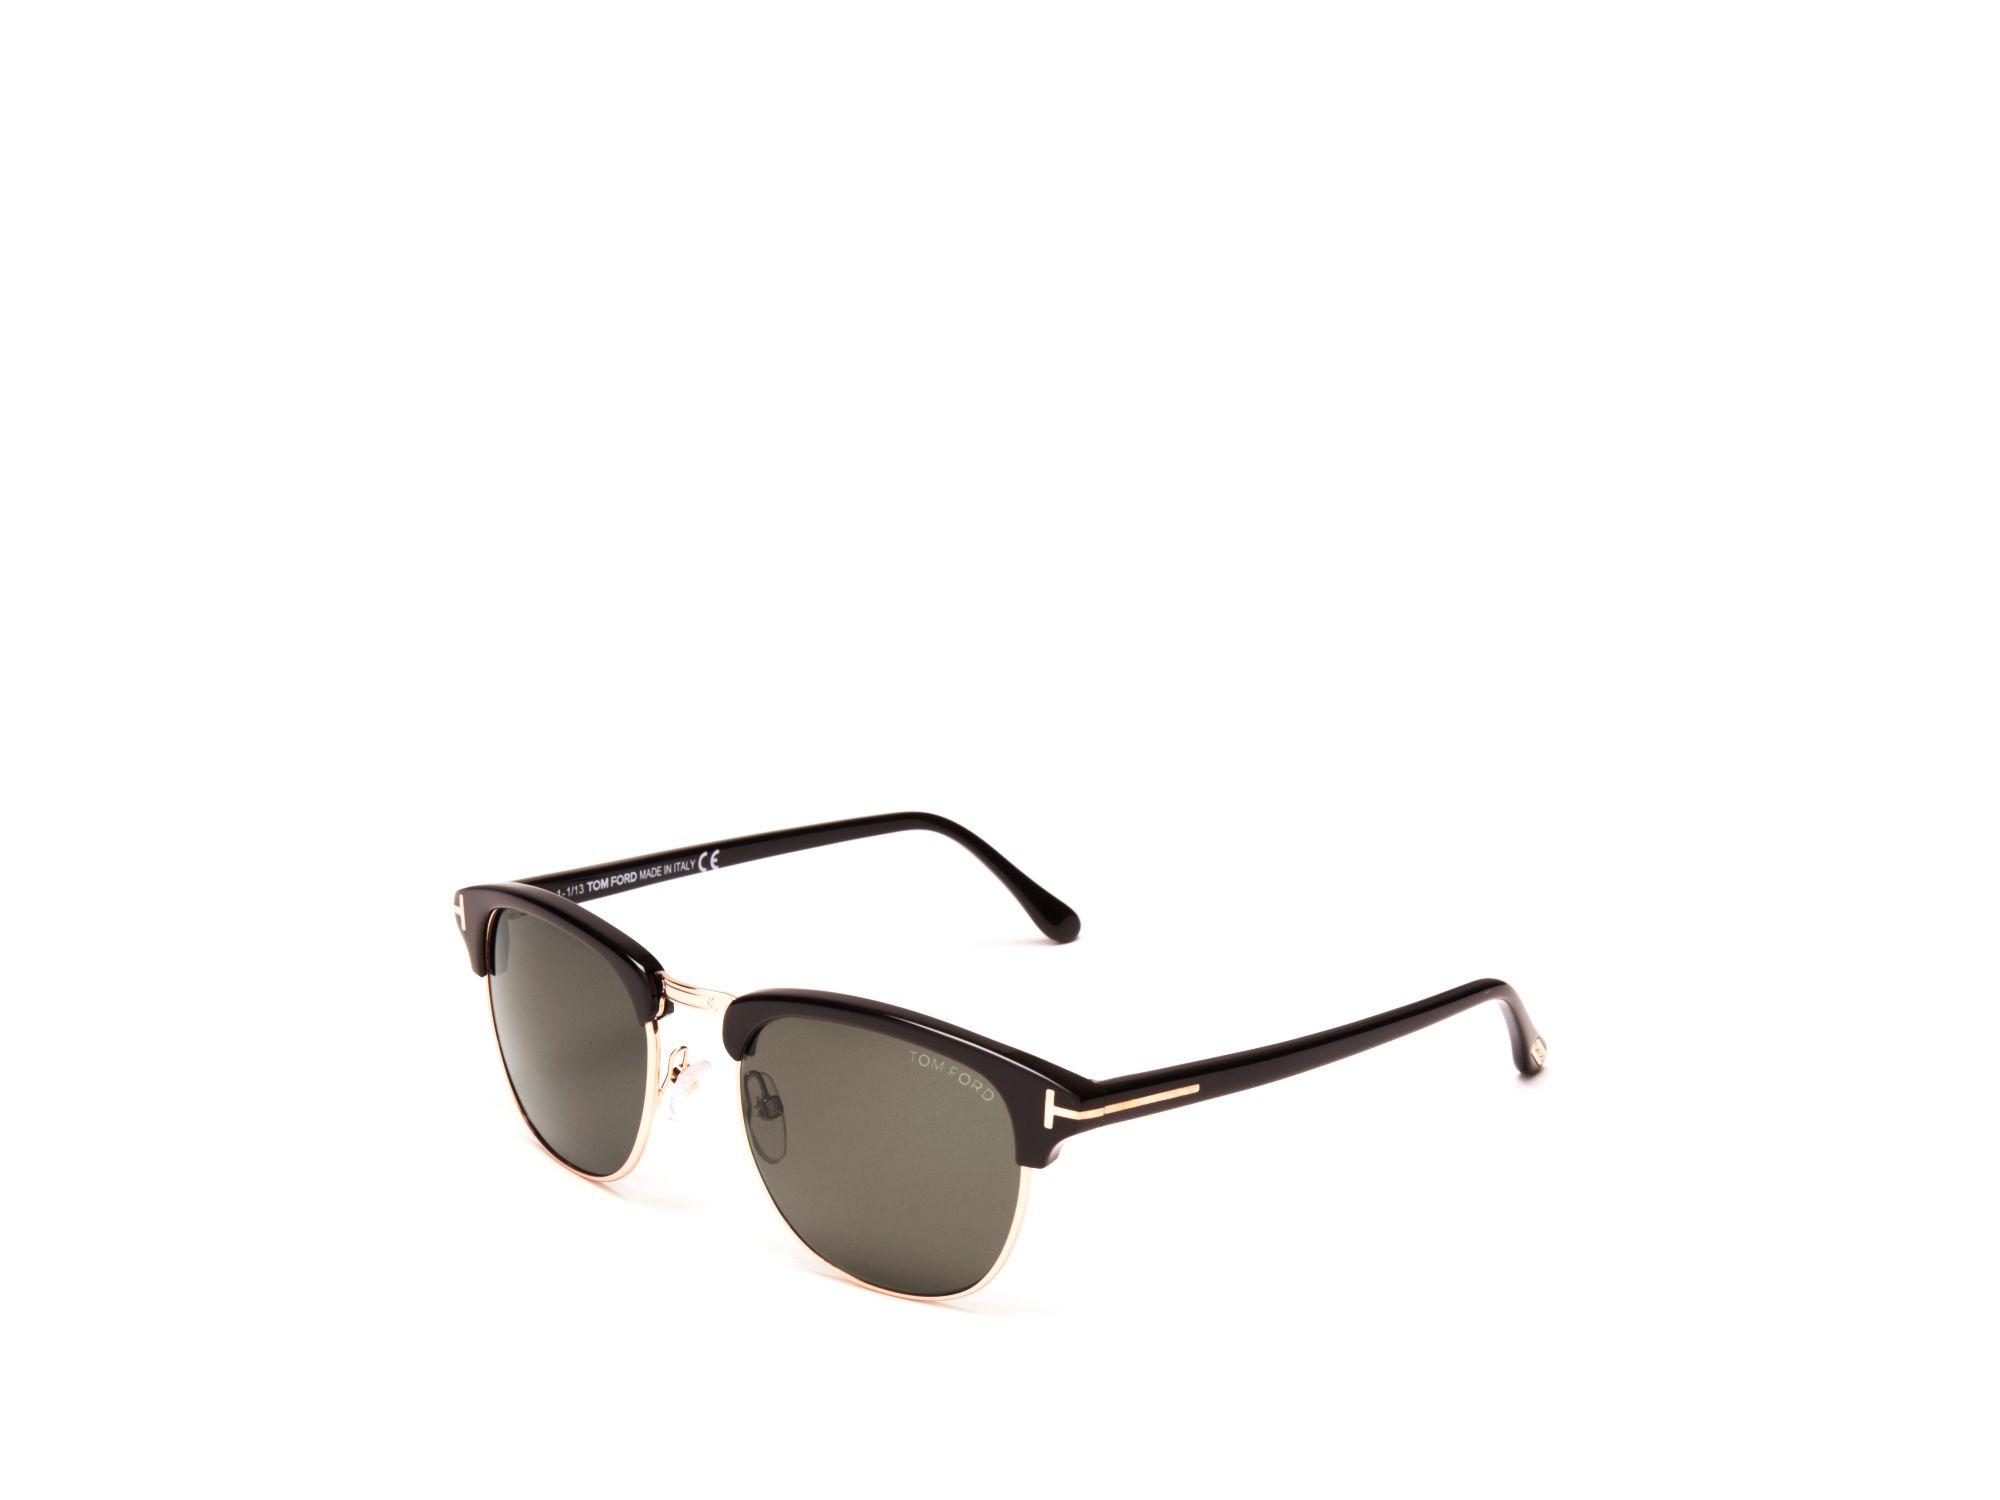 f6df2bd8c4 Tom Ford Clubmaster Sunglasses Henry